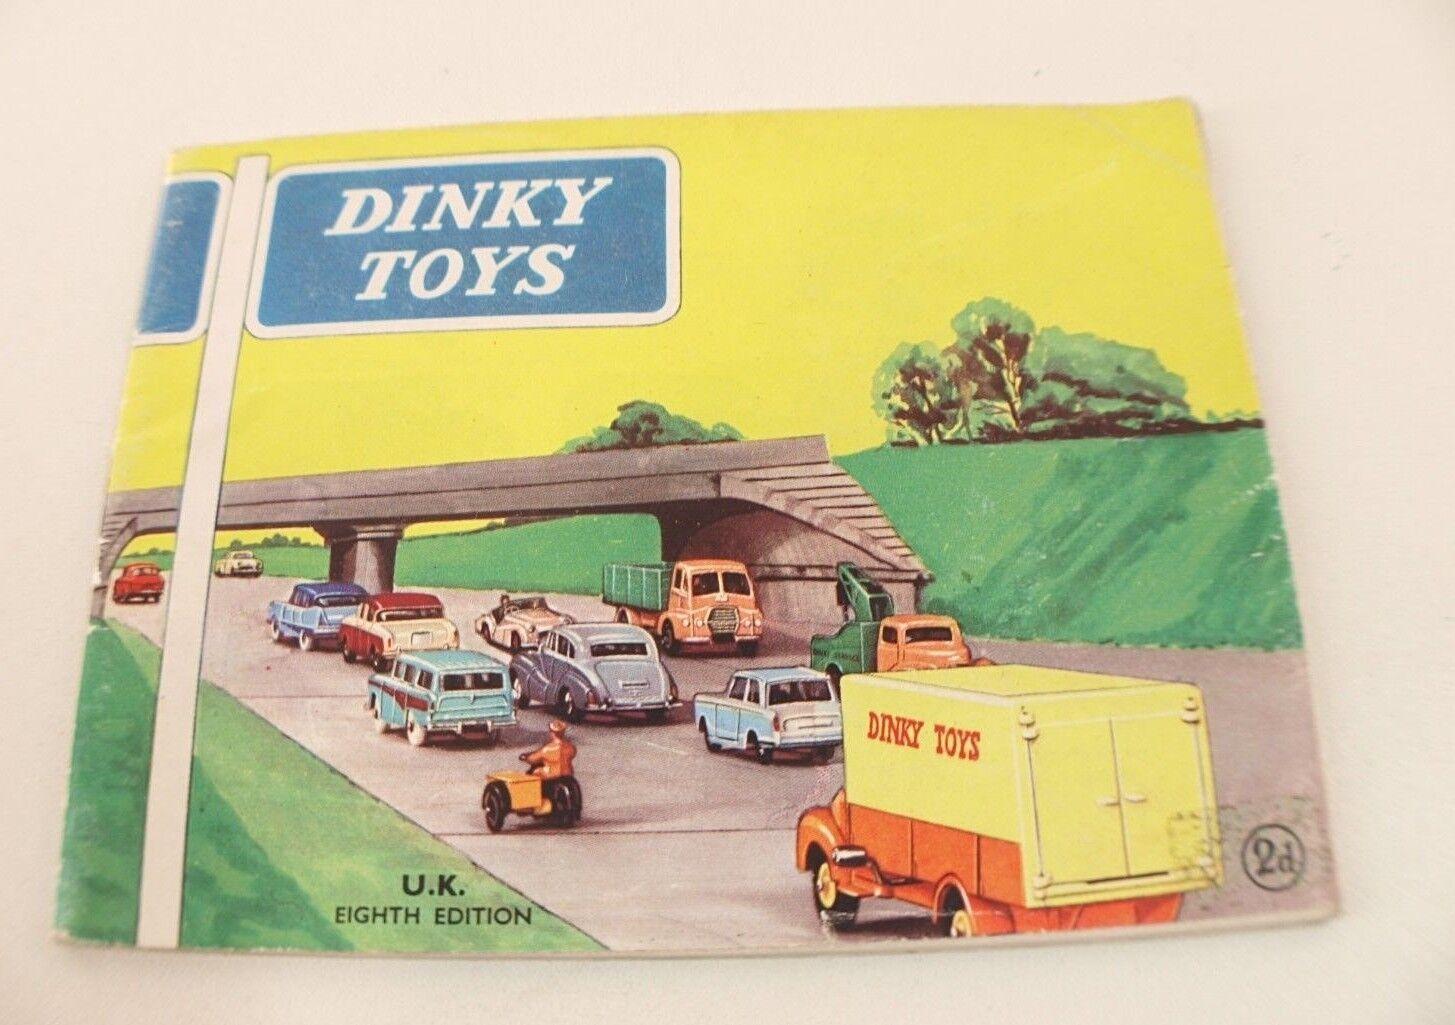 Catalog Dinky Toys GB n.8 eight edition